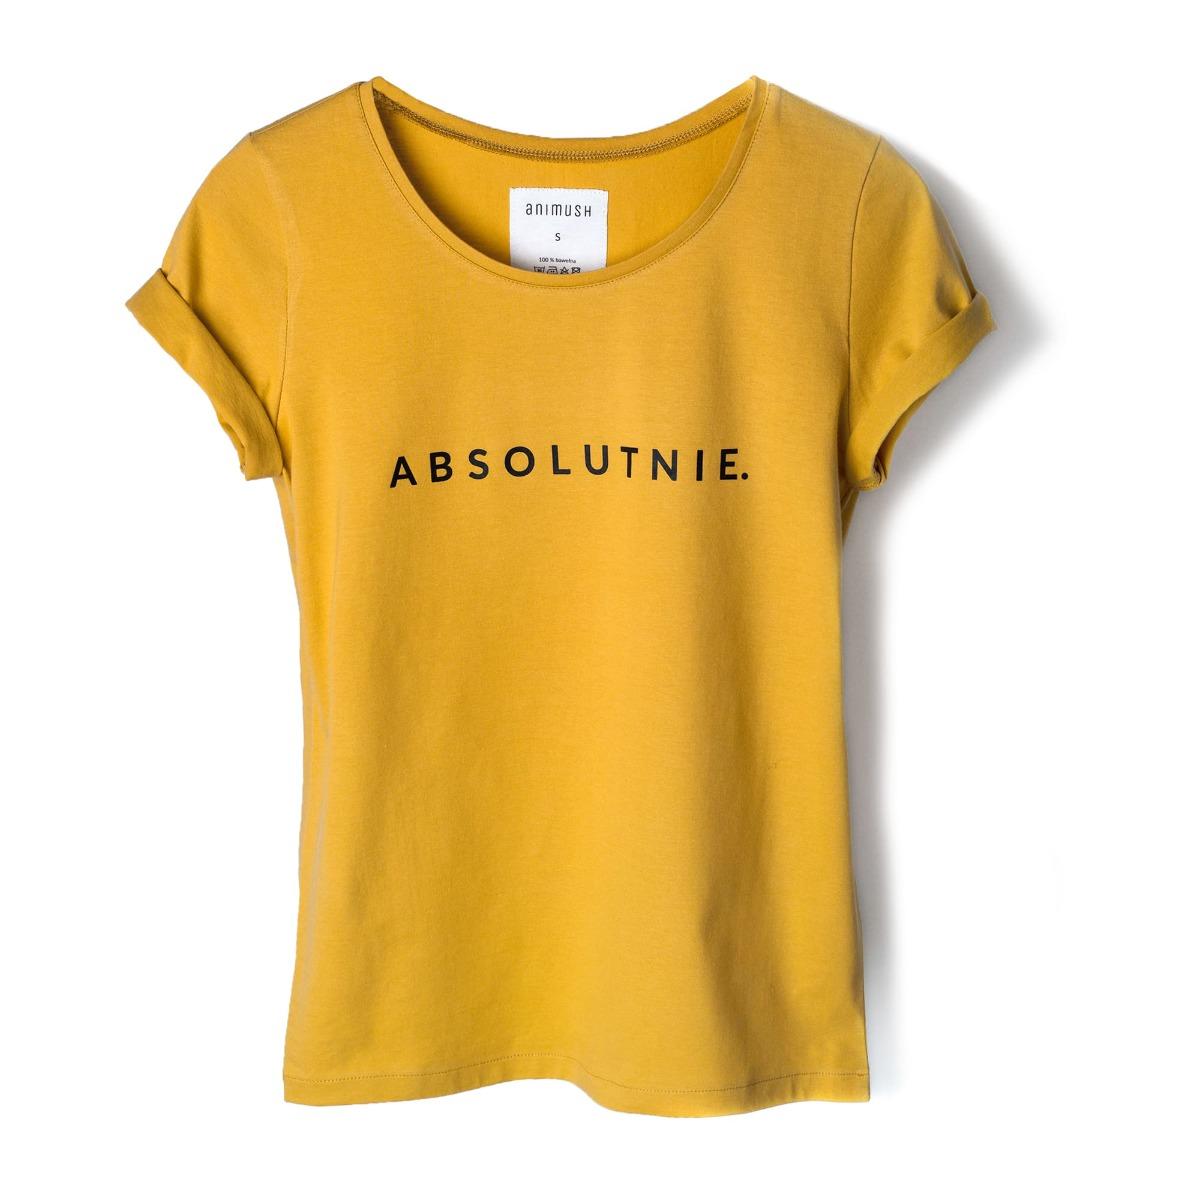 T-shirt musztardowy ABSOLUTNIE.